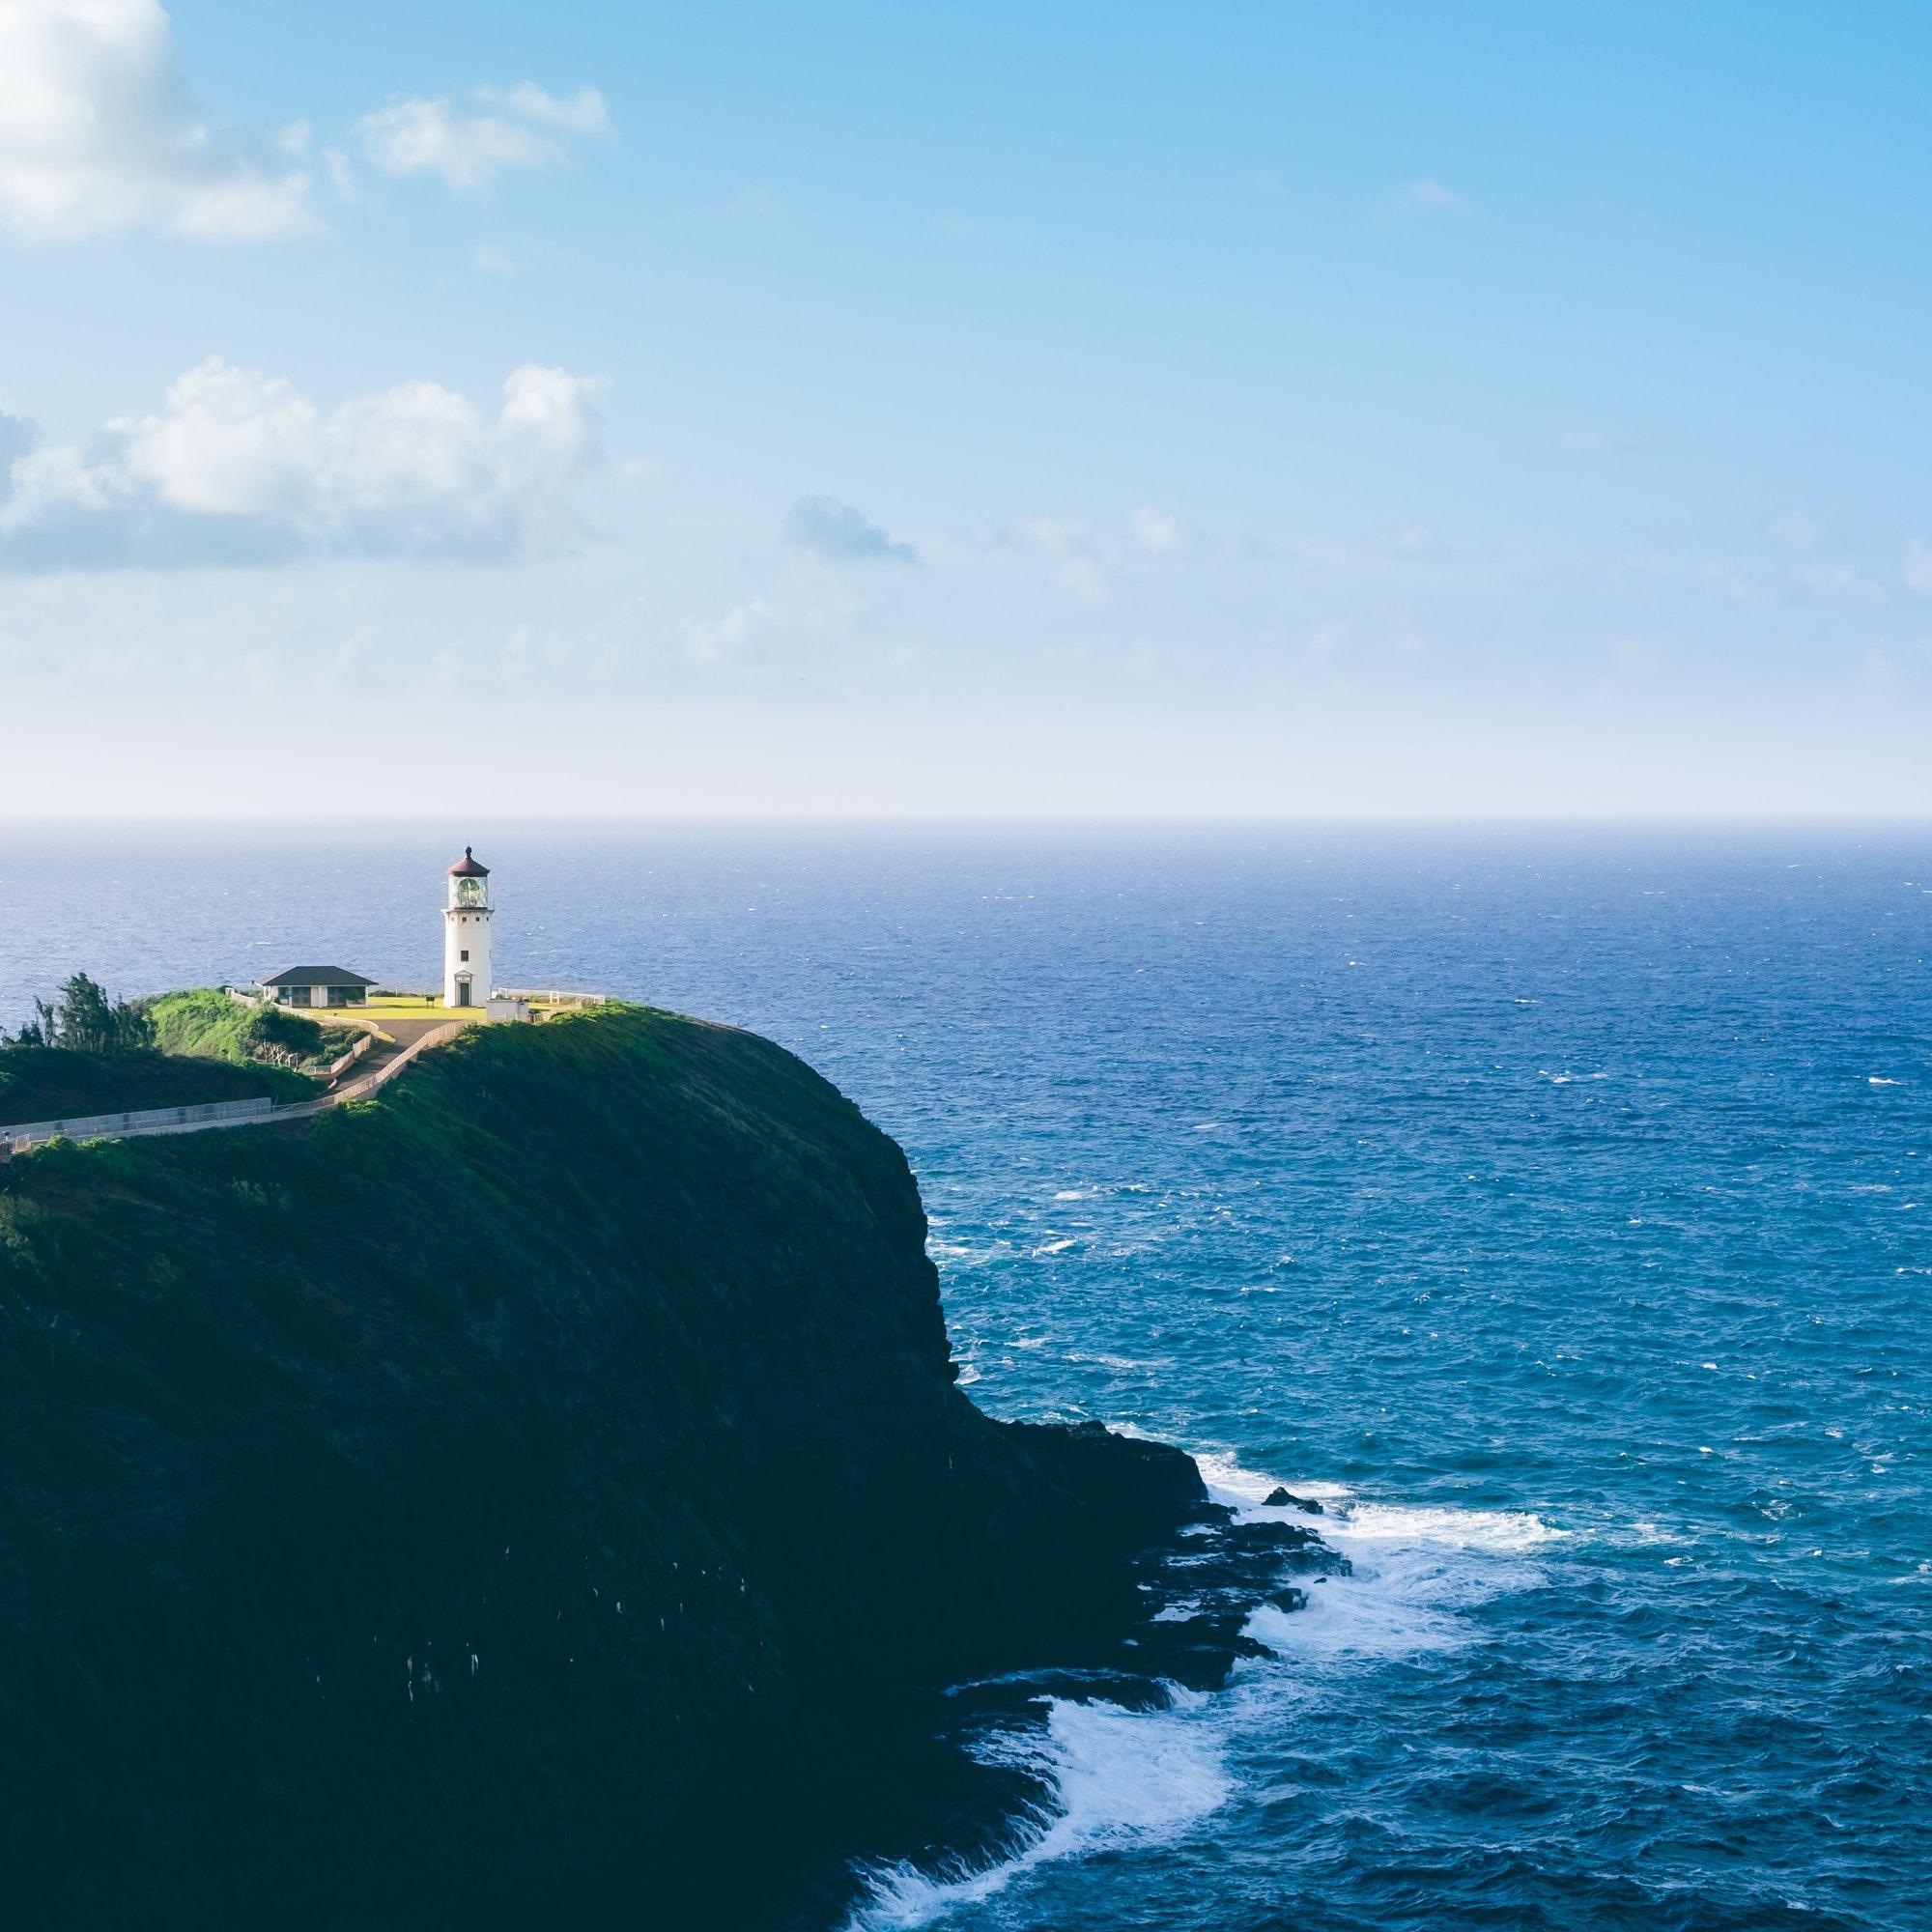 Landscape view of Kilauea lighthouse on Kauai